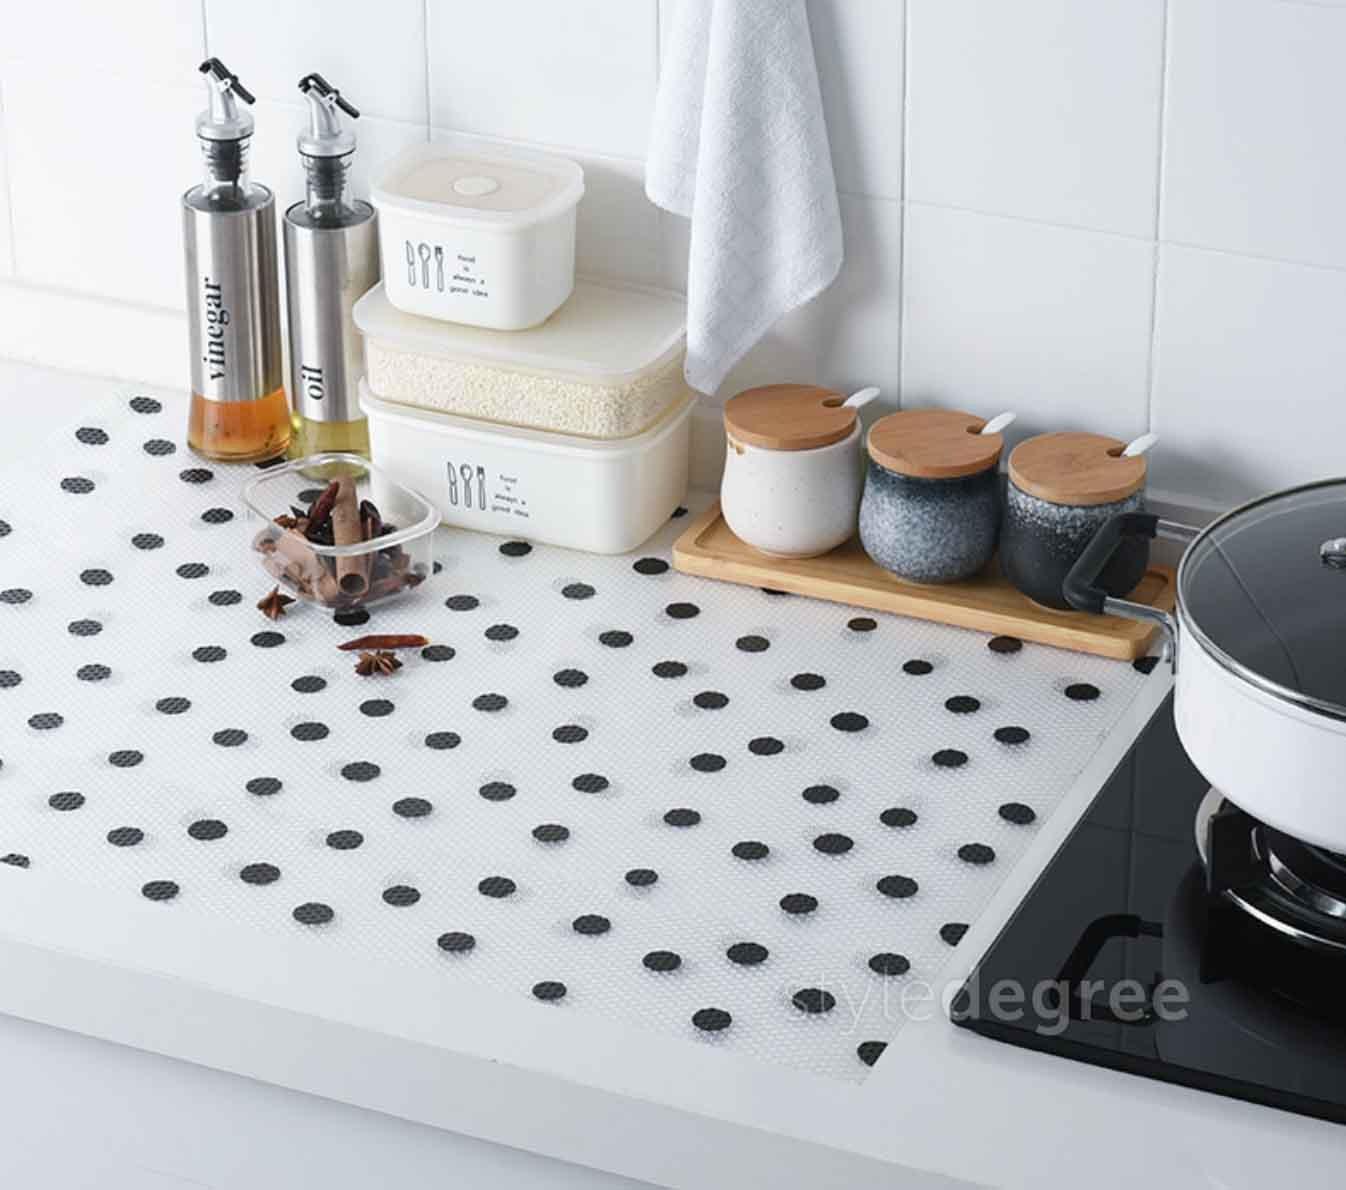 What Is The Best Shelf Liner For Kitchen Cabinets: Pattern Kitchen Shelf & Drawer Liner Mat